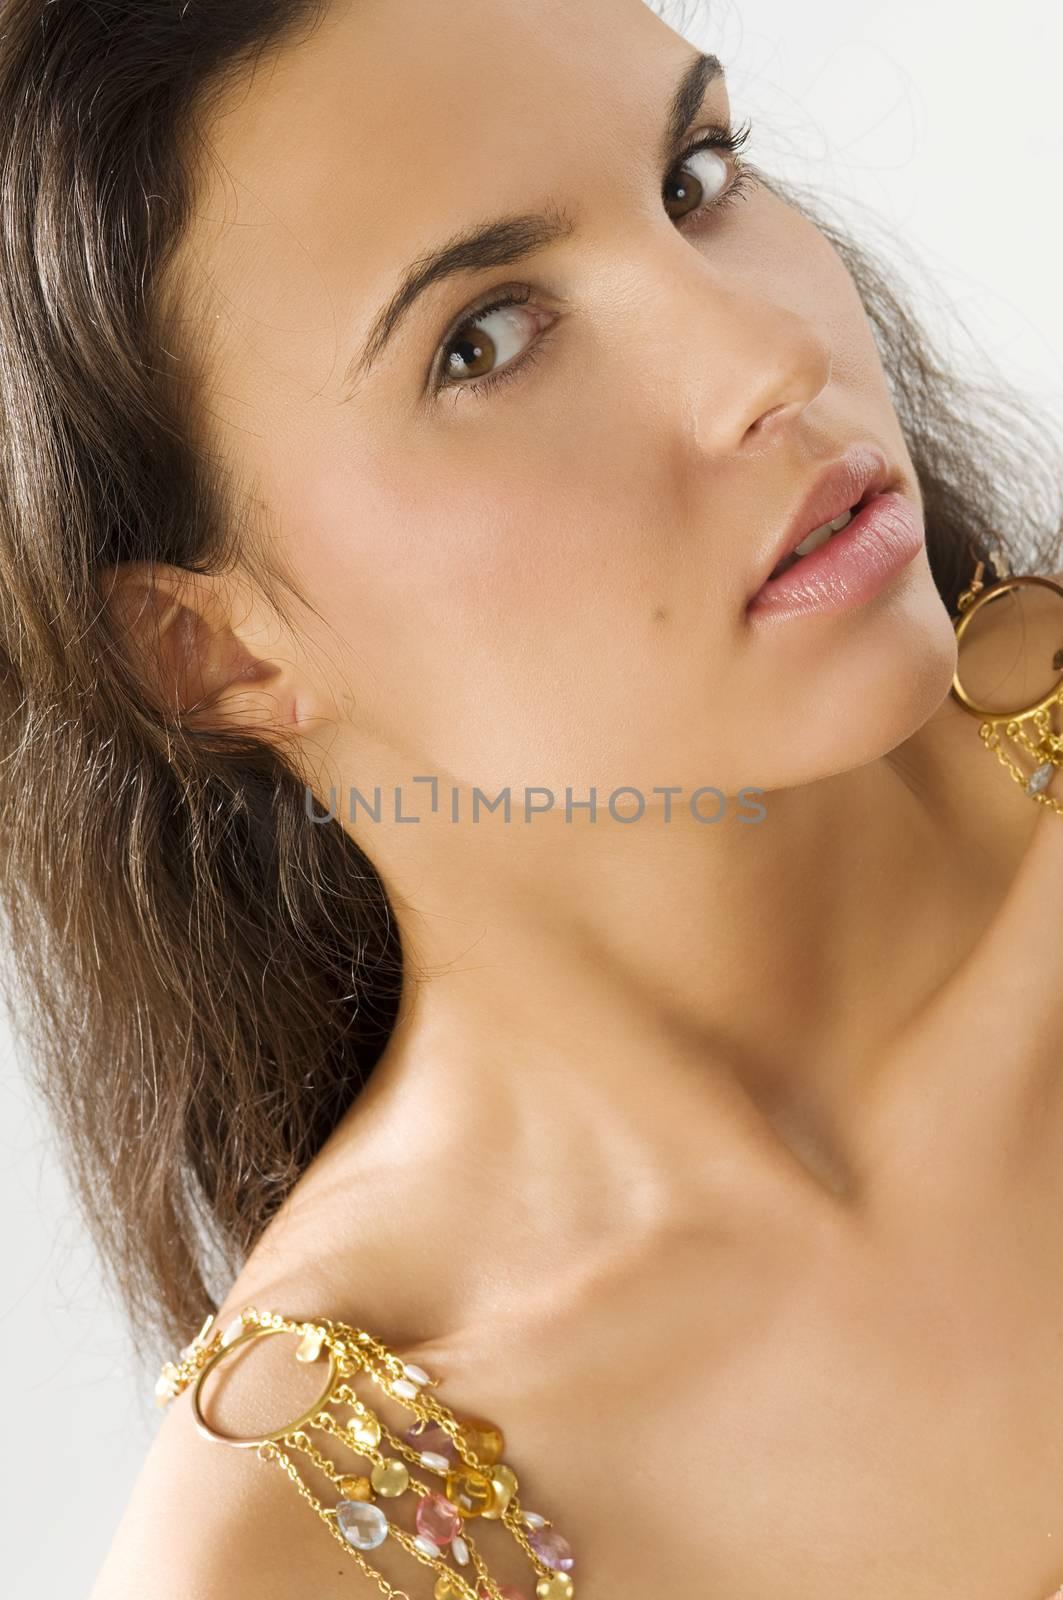 sensual beauty by fotoCD